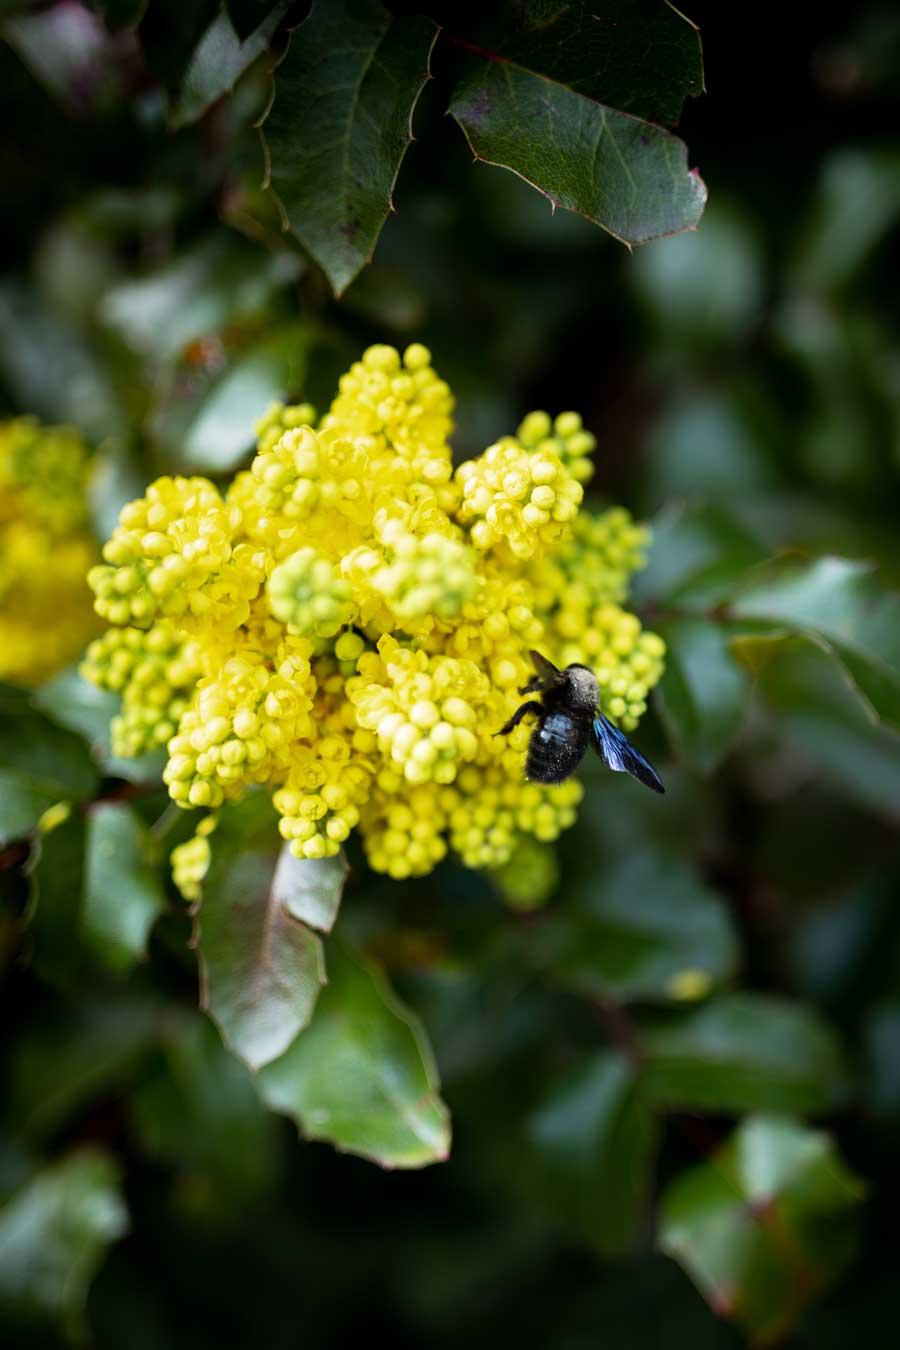 wildbienen-blaue-holzbiene-gehoernte-mauerbiene-hinigbiene1